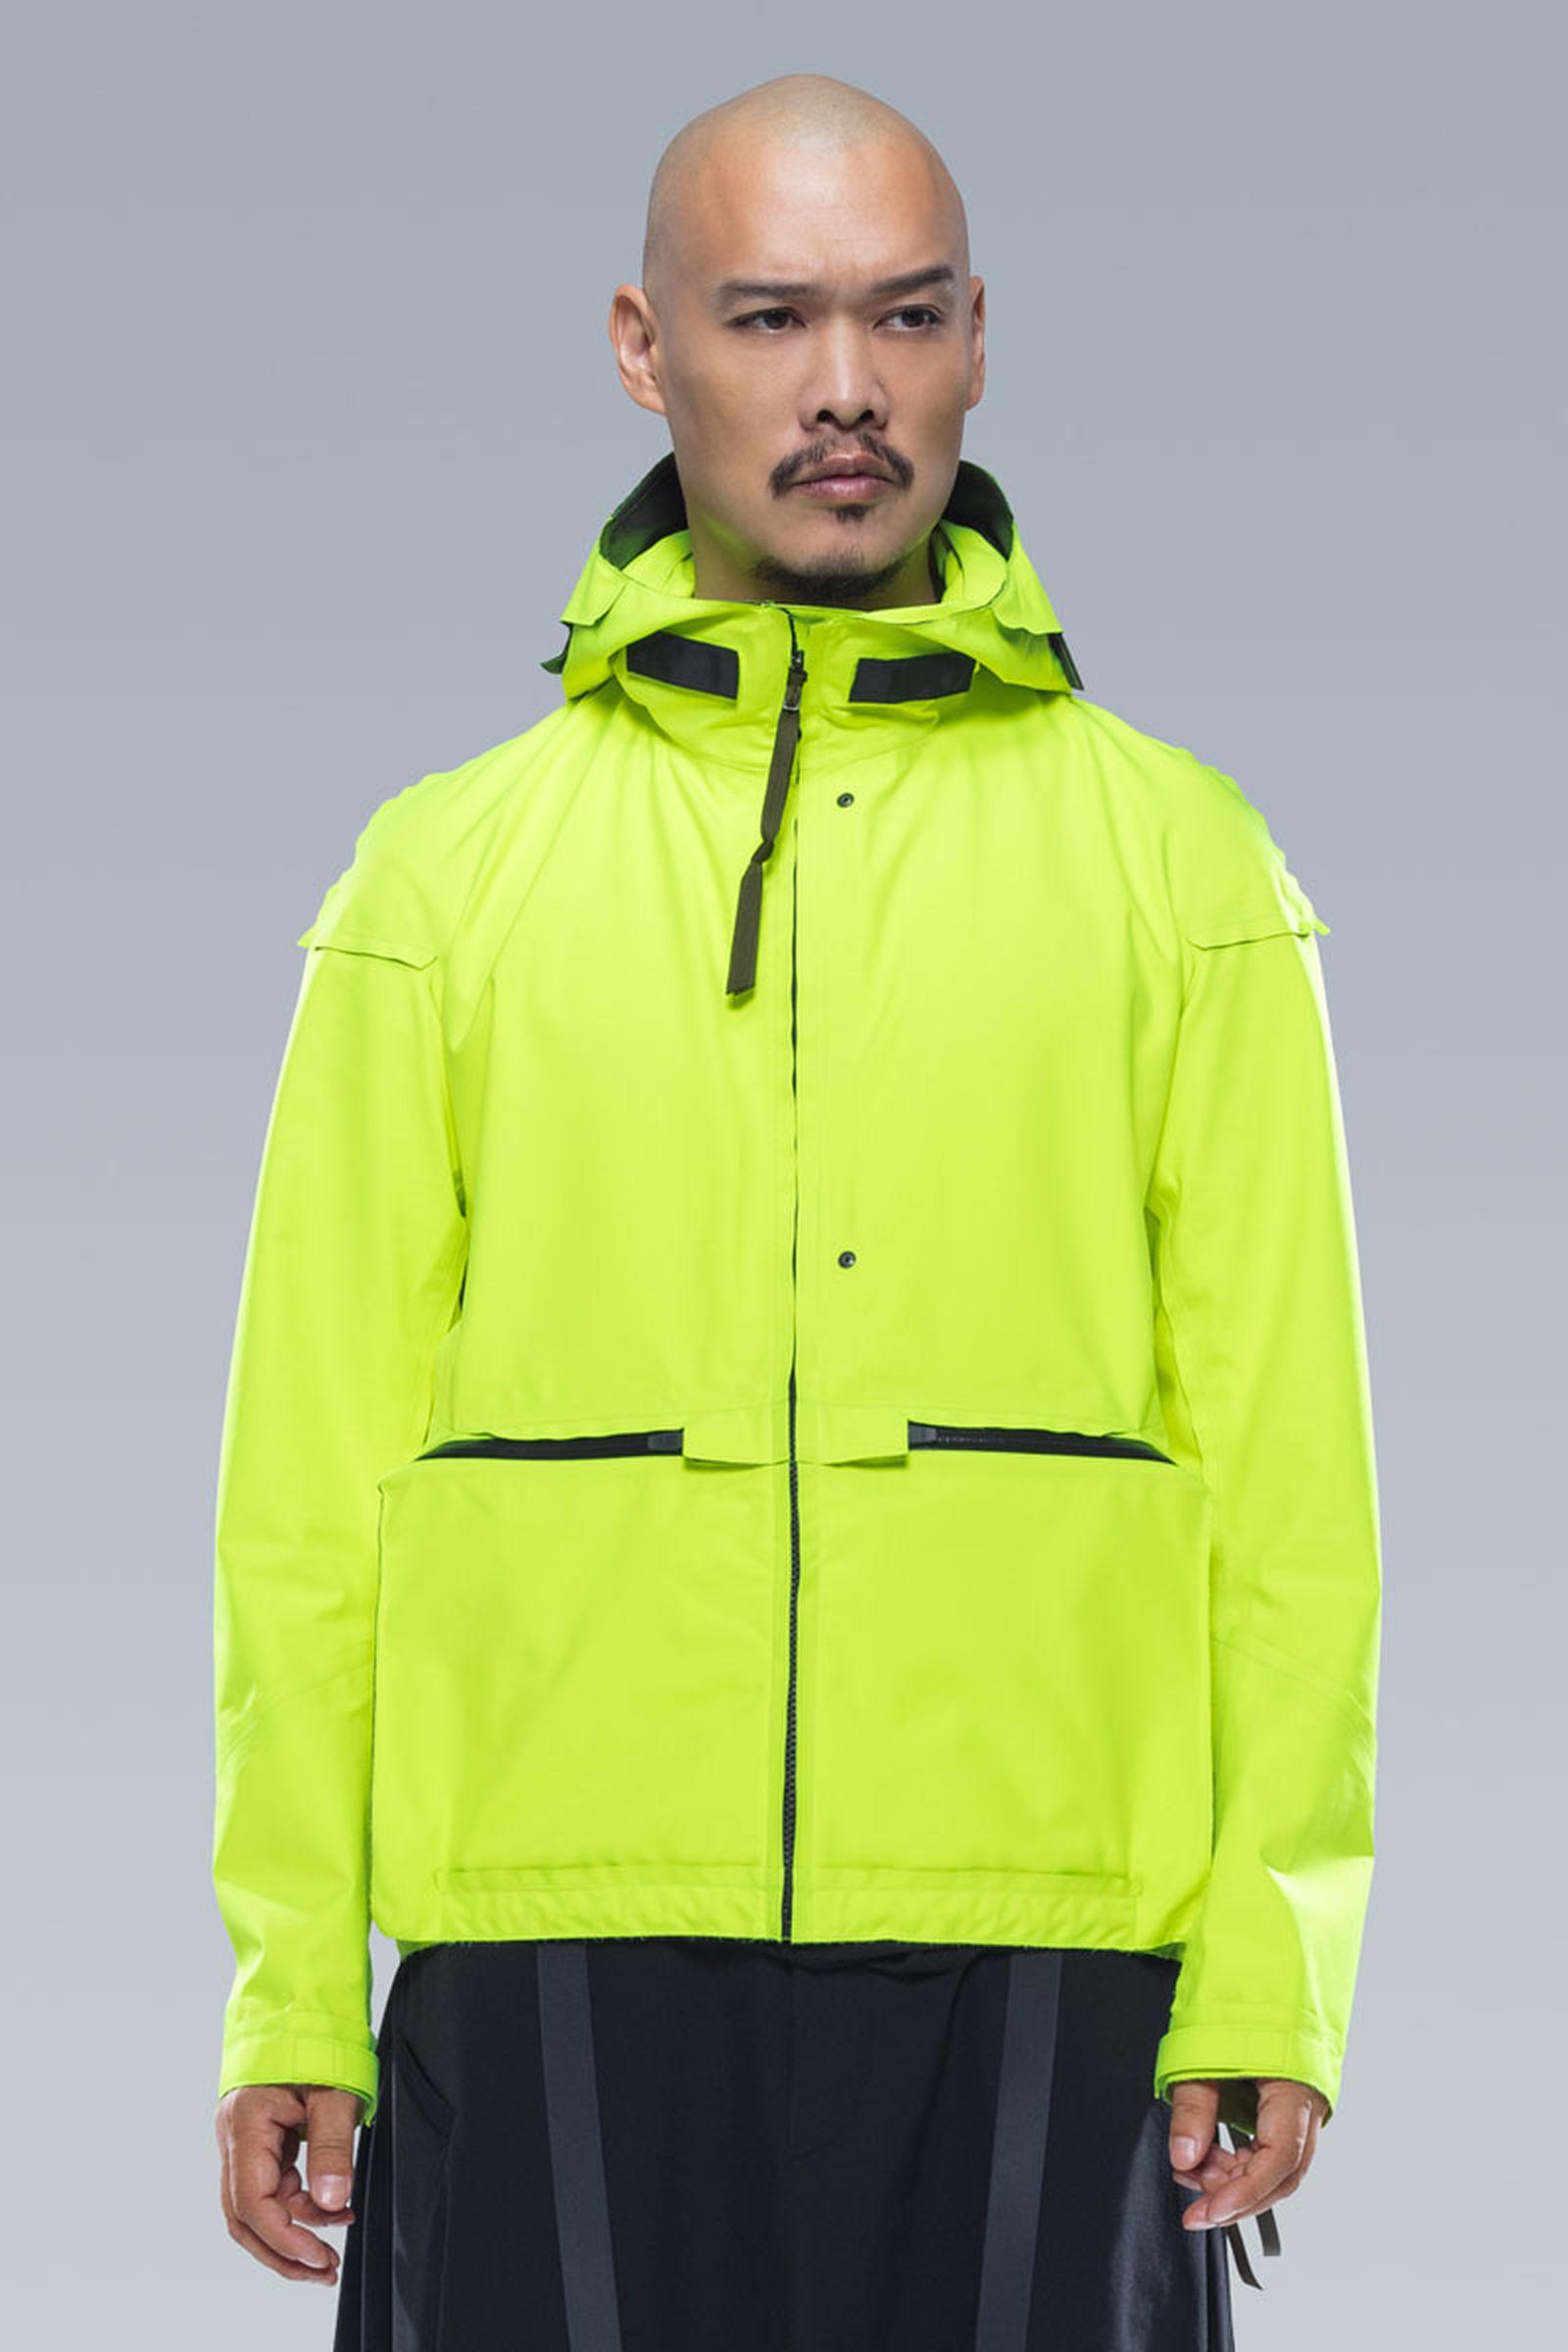 german clothing brands acronym german clothing brands 023c Adidas Boulezar